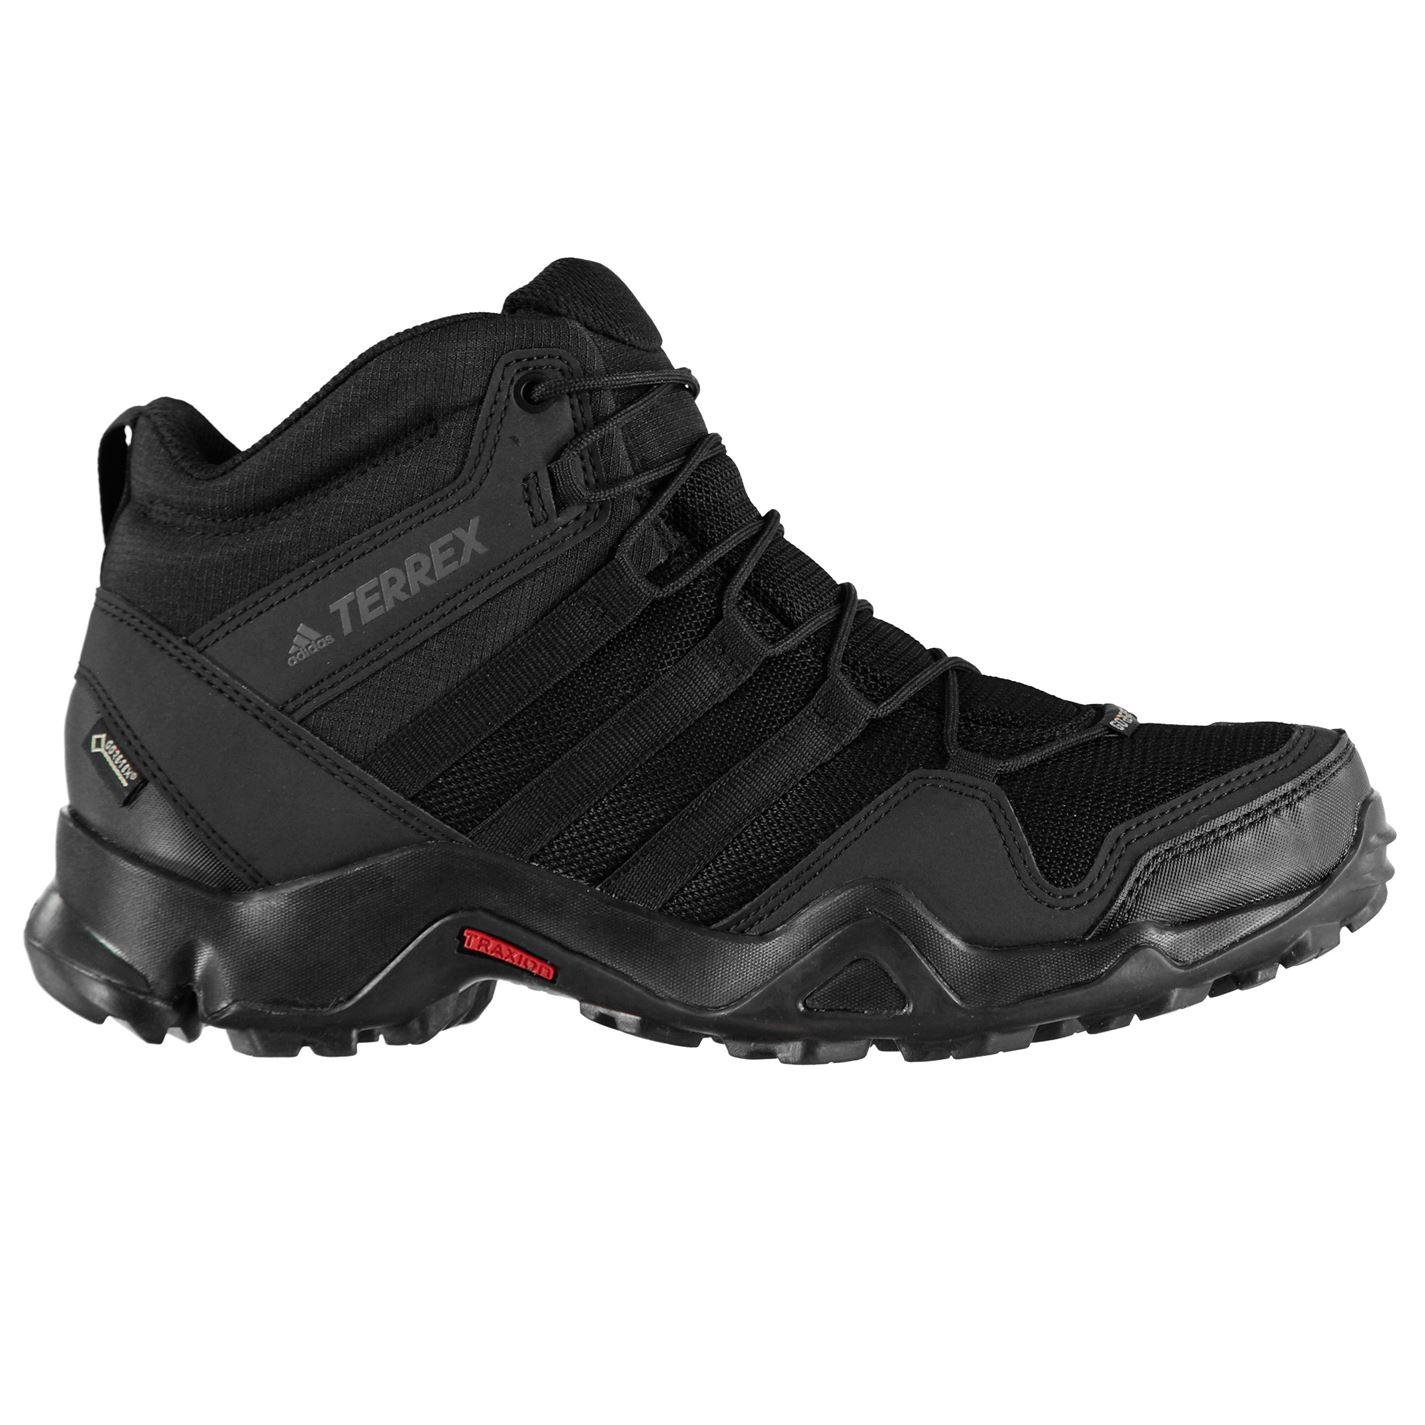 Adidas TERREX AX3R Mid GTX Mens Walking Shoes